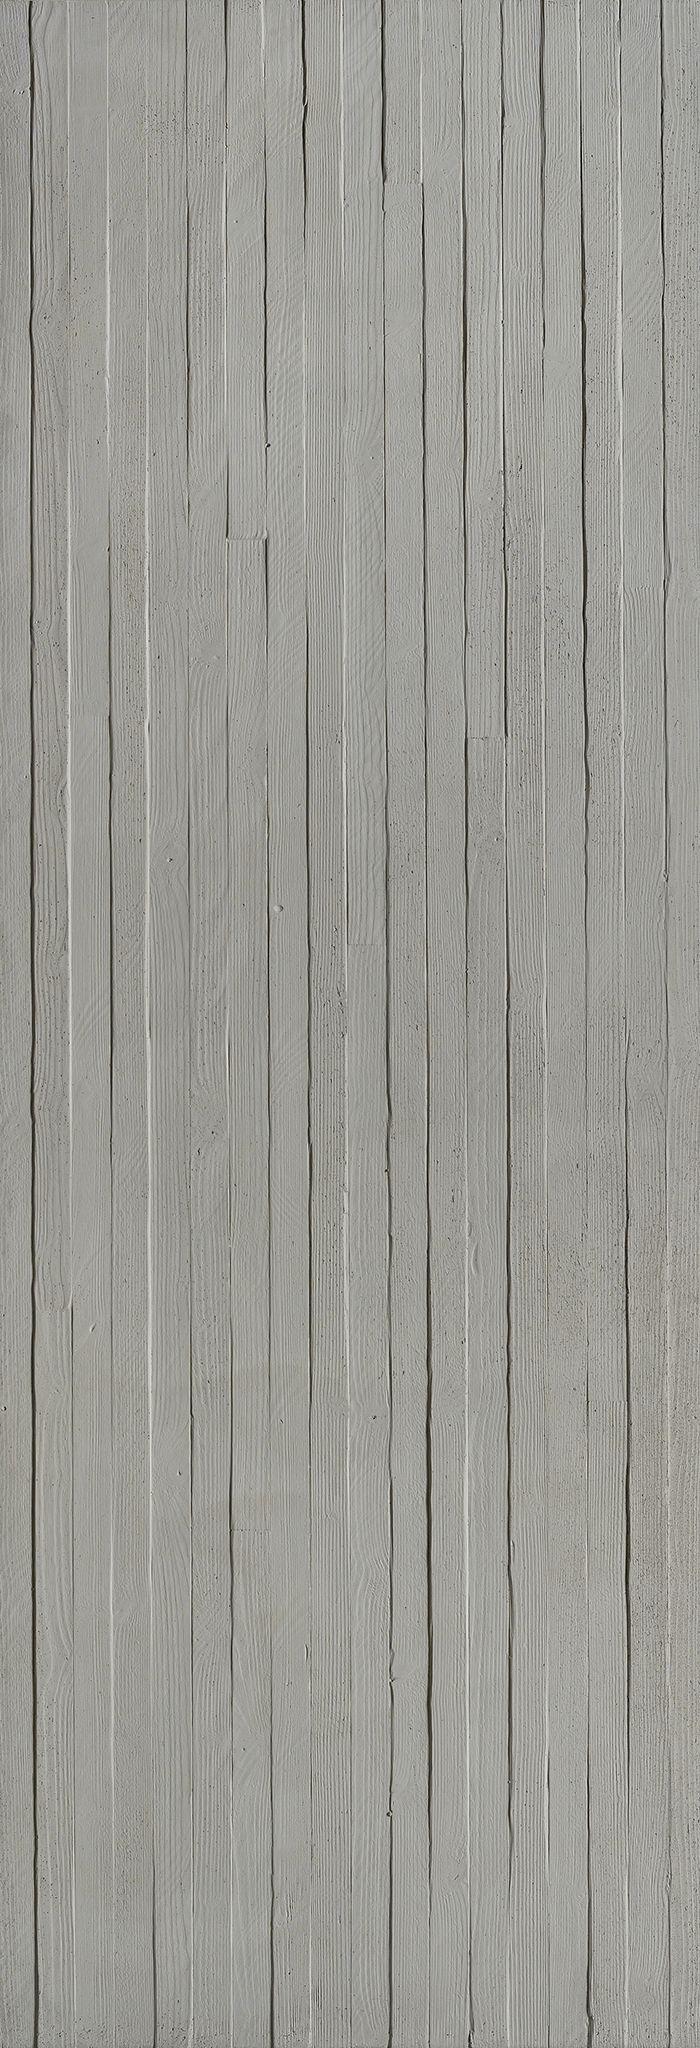 Panbeton® Vertical planks